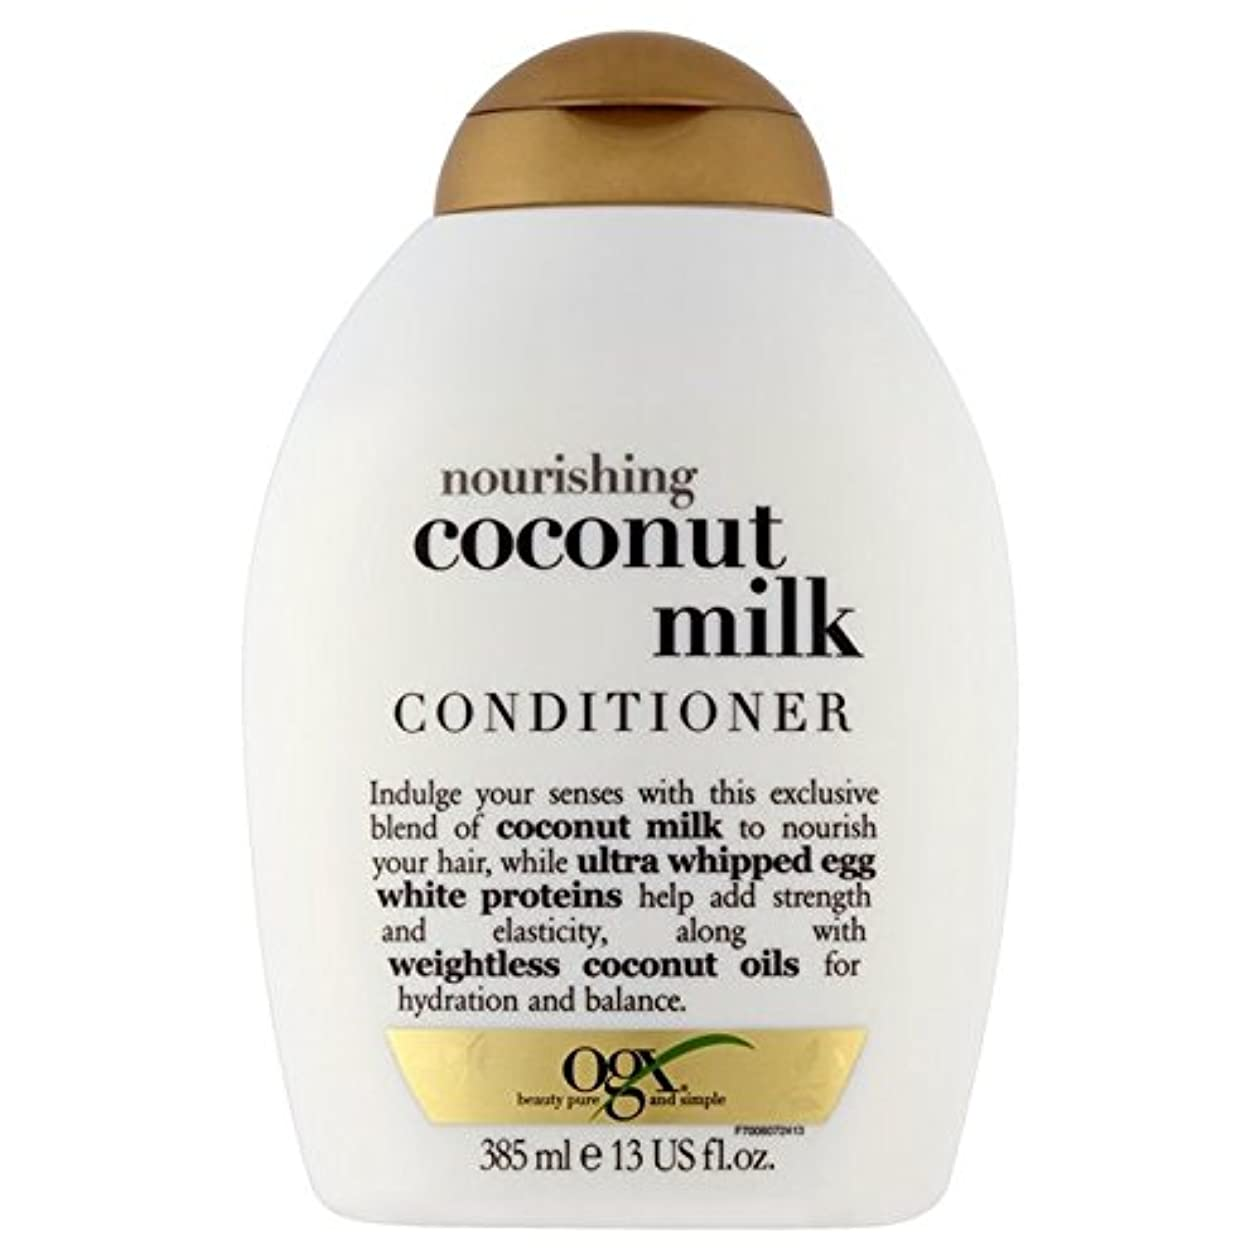 Ogx Coconut Milk Conditioner 385ml - ココナッツミルクコンディショナー385ミリリットル [並行輸入品]